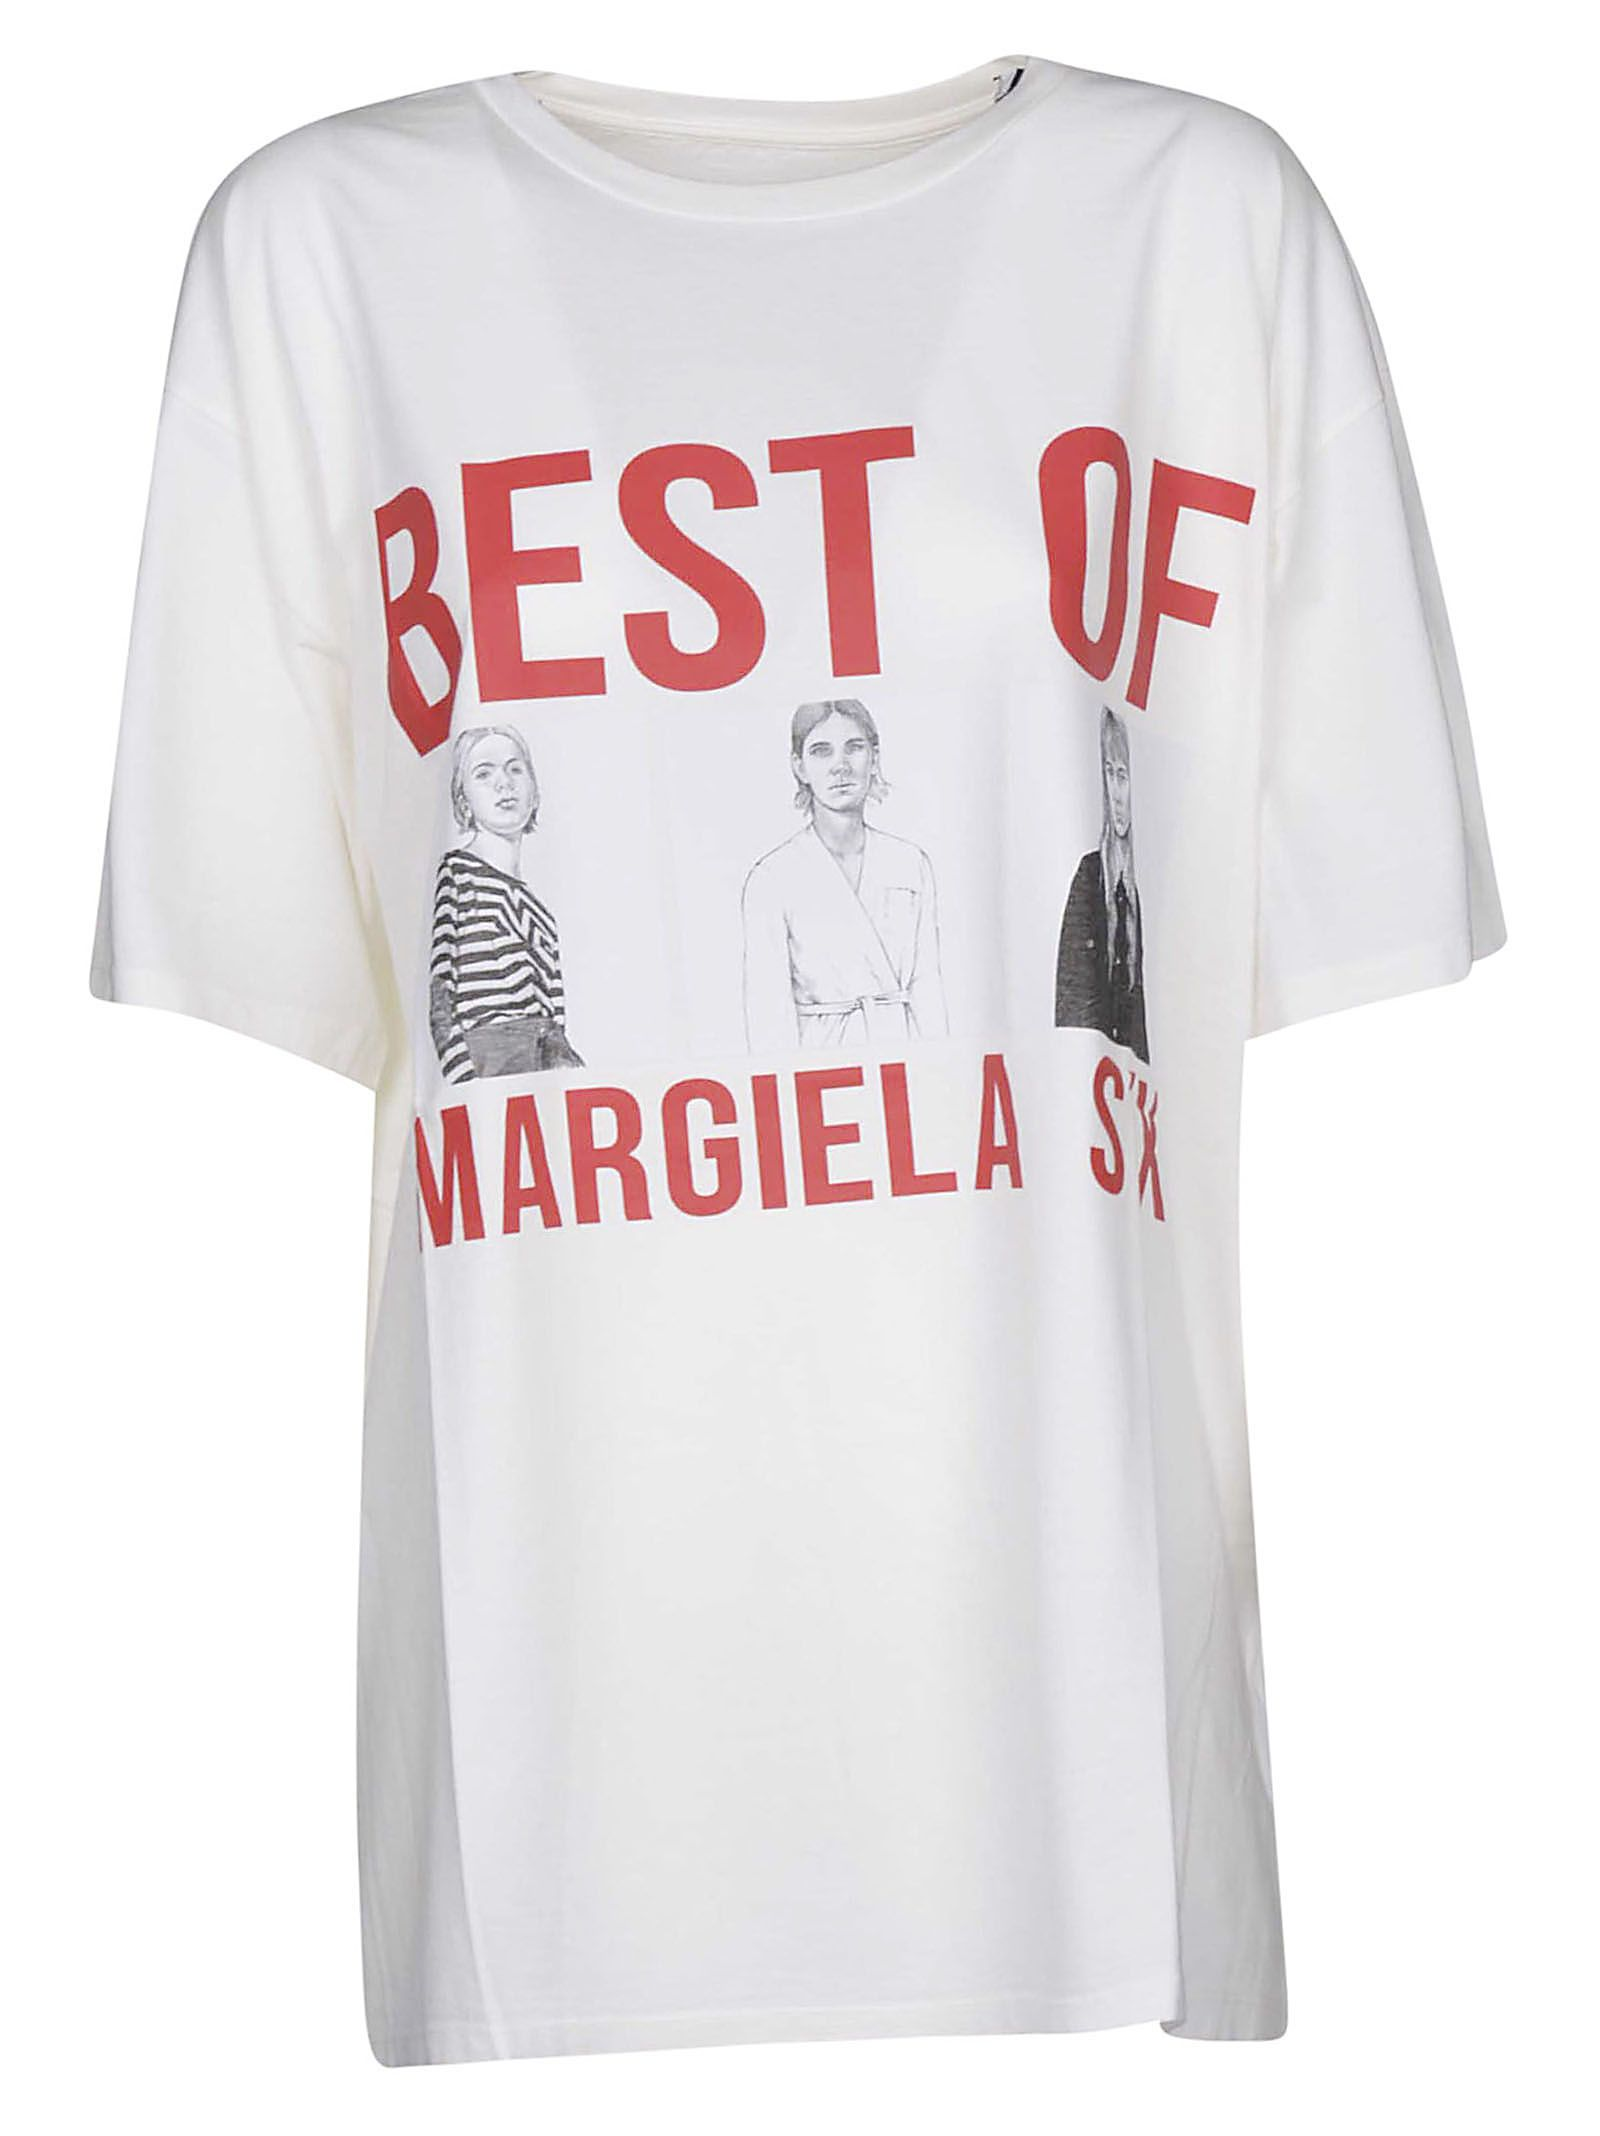 Italist Best Price In The Market For Maison Margiela Maison